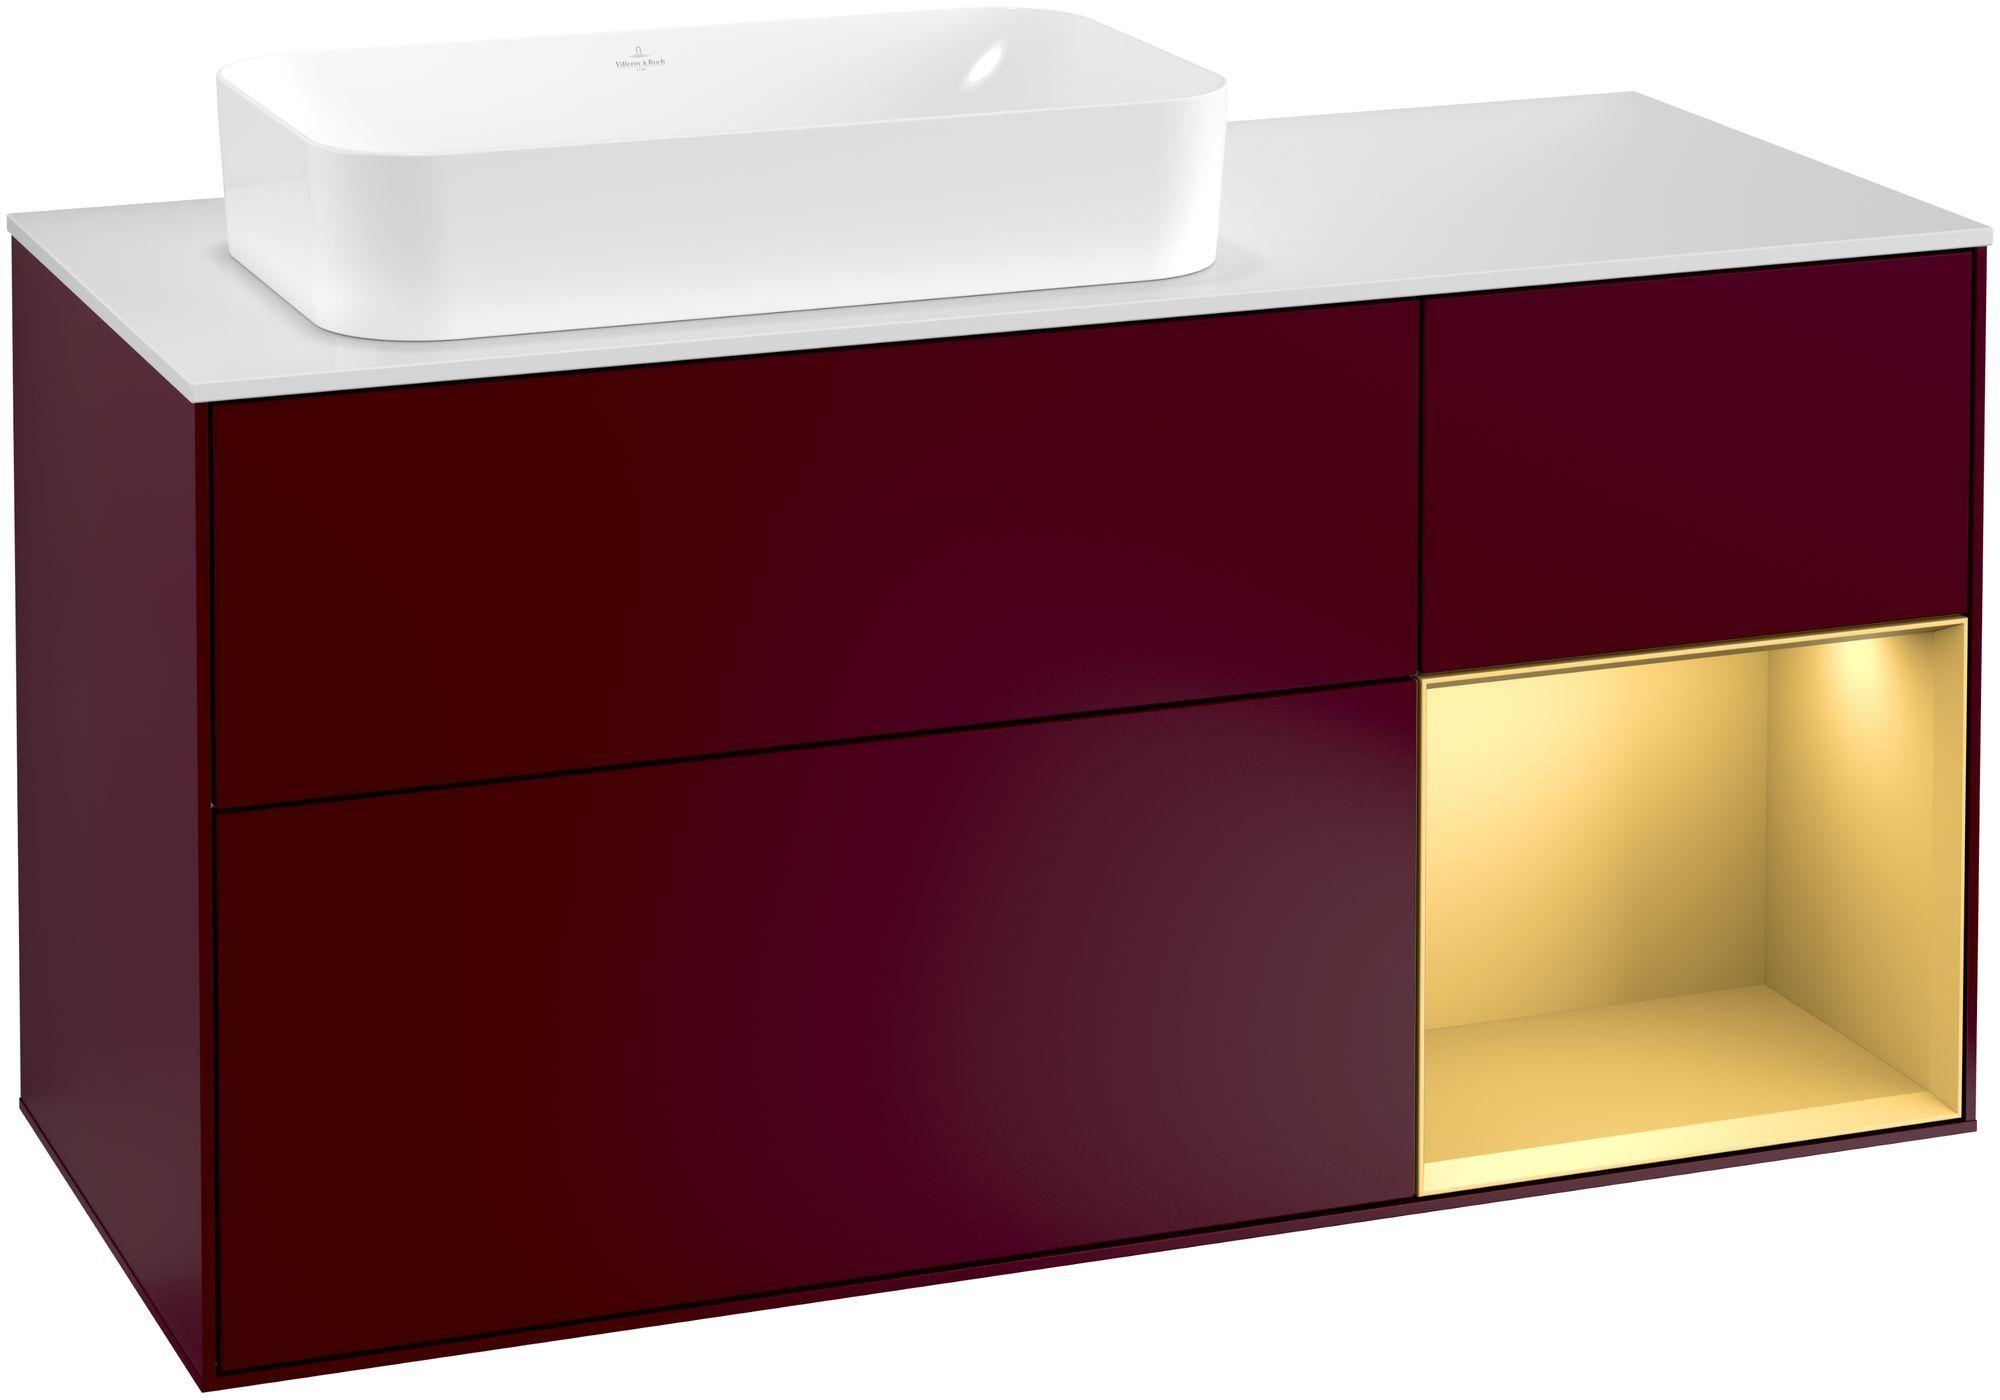 Villeroy & Boch Finion F28 Waschtischunterschrank mit Regalelement 3 Auszüge Waschtisch links LED-Beleuchtung B:120xH:60,3xT:50,1cm Front, Korpus: Peony, Regal: Gold Matt, Glasplatte: White Matt F281HFHB